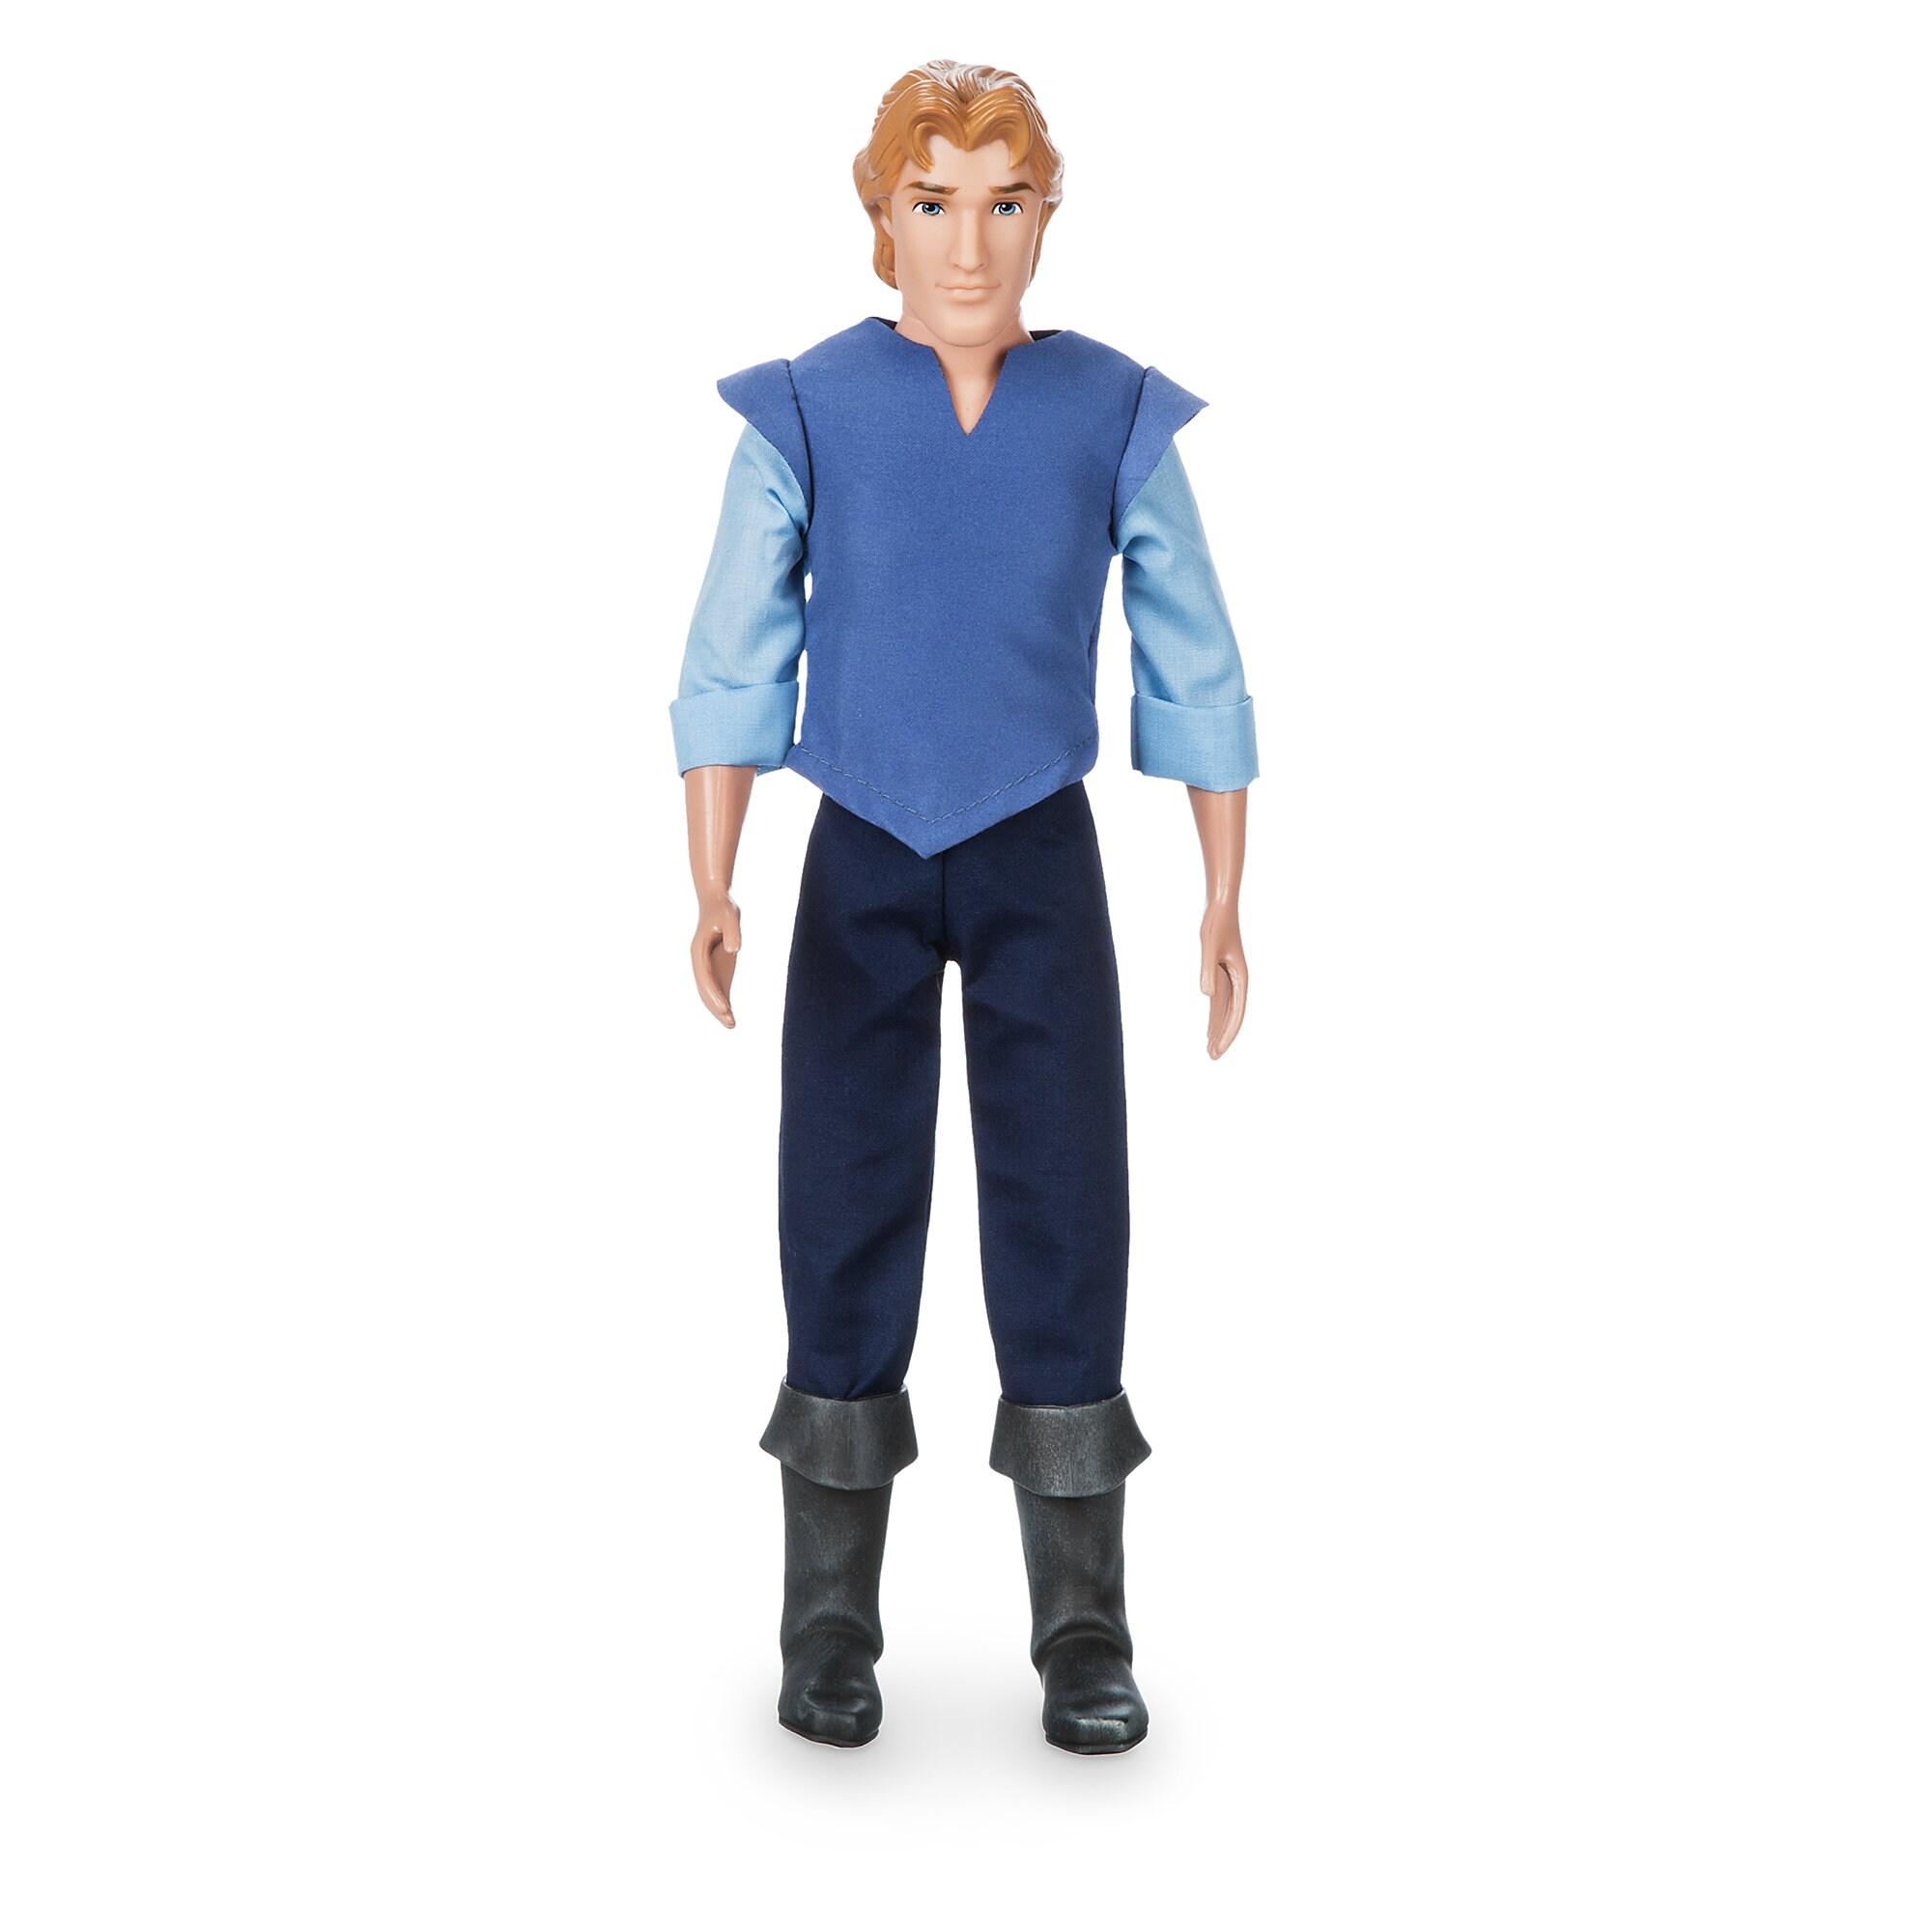 Captain John Smith Classic Doll - Pocahontas - 12''